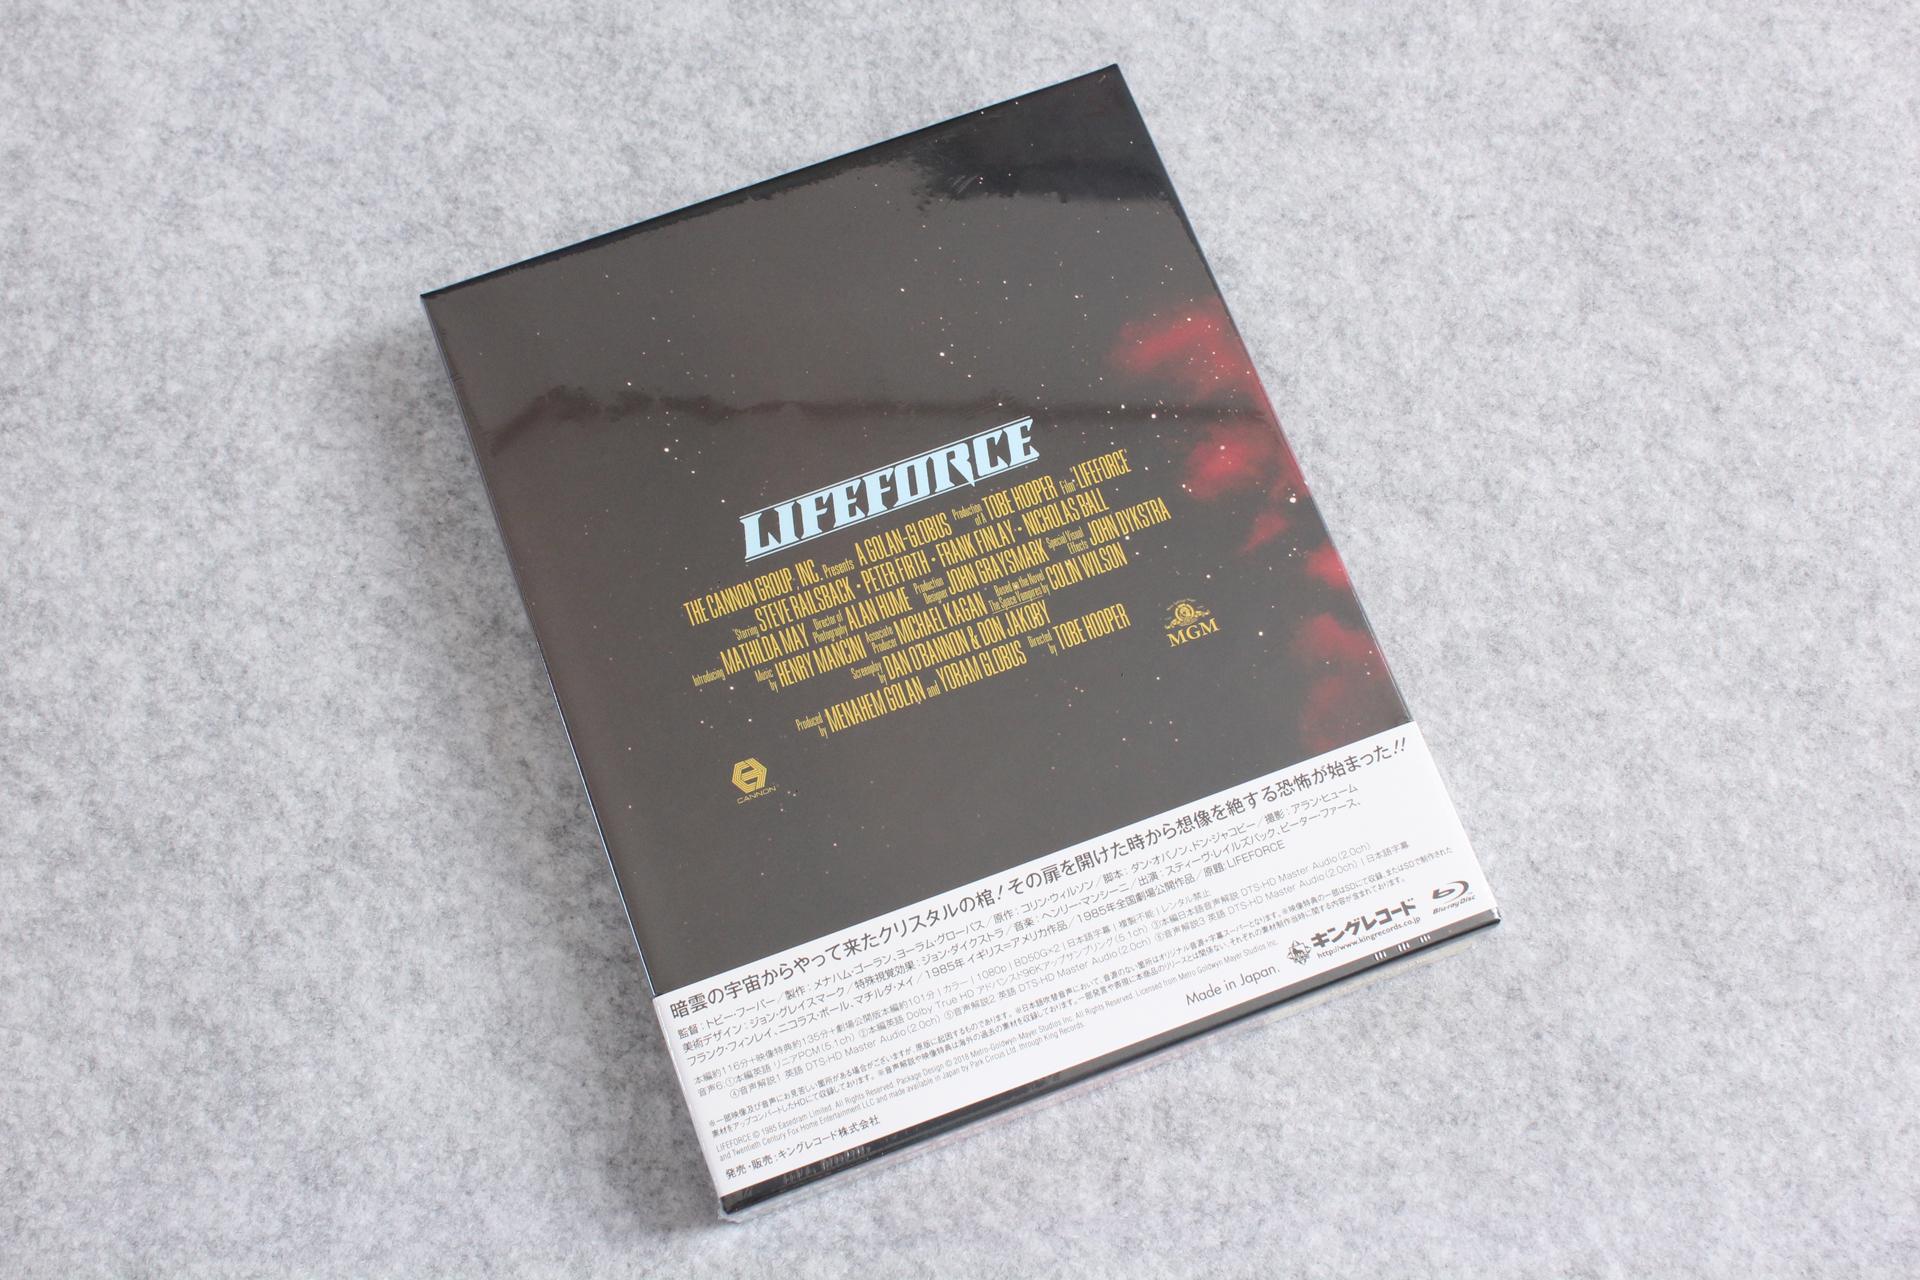 2018-11-14-LIFEFORCE_FE-2.JPG